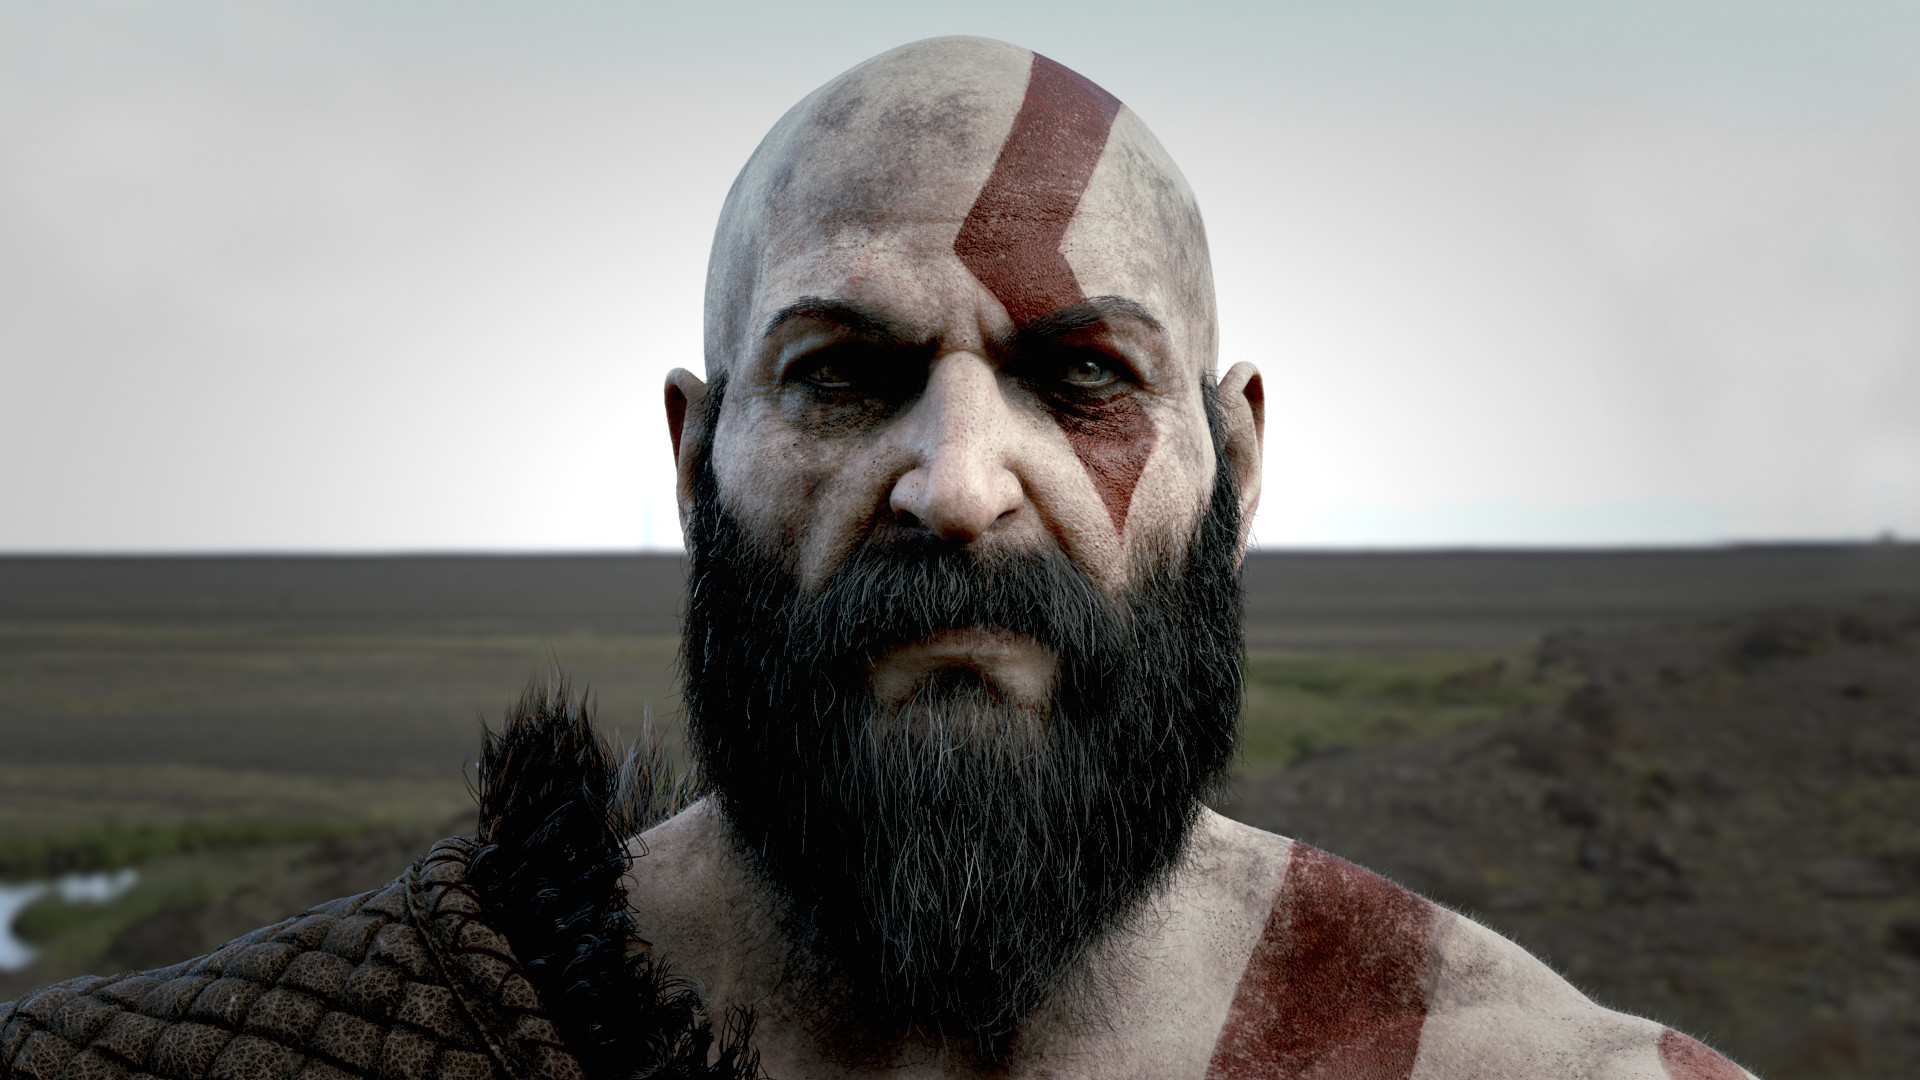 ArtStation - Kratos, ANIMAL PASK